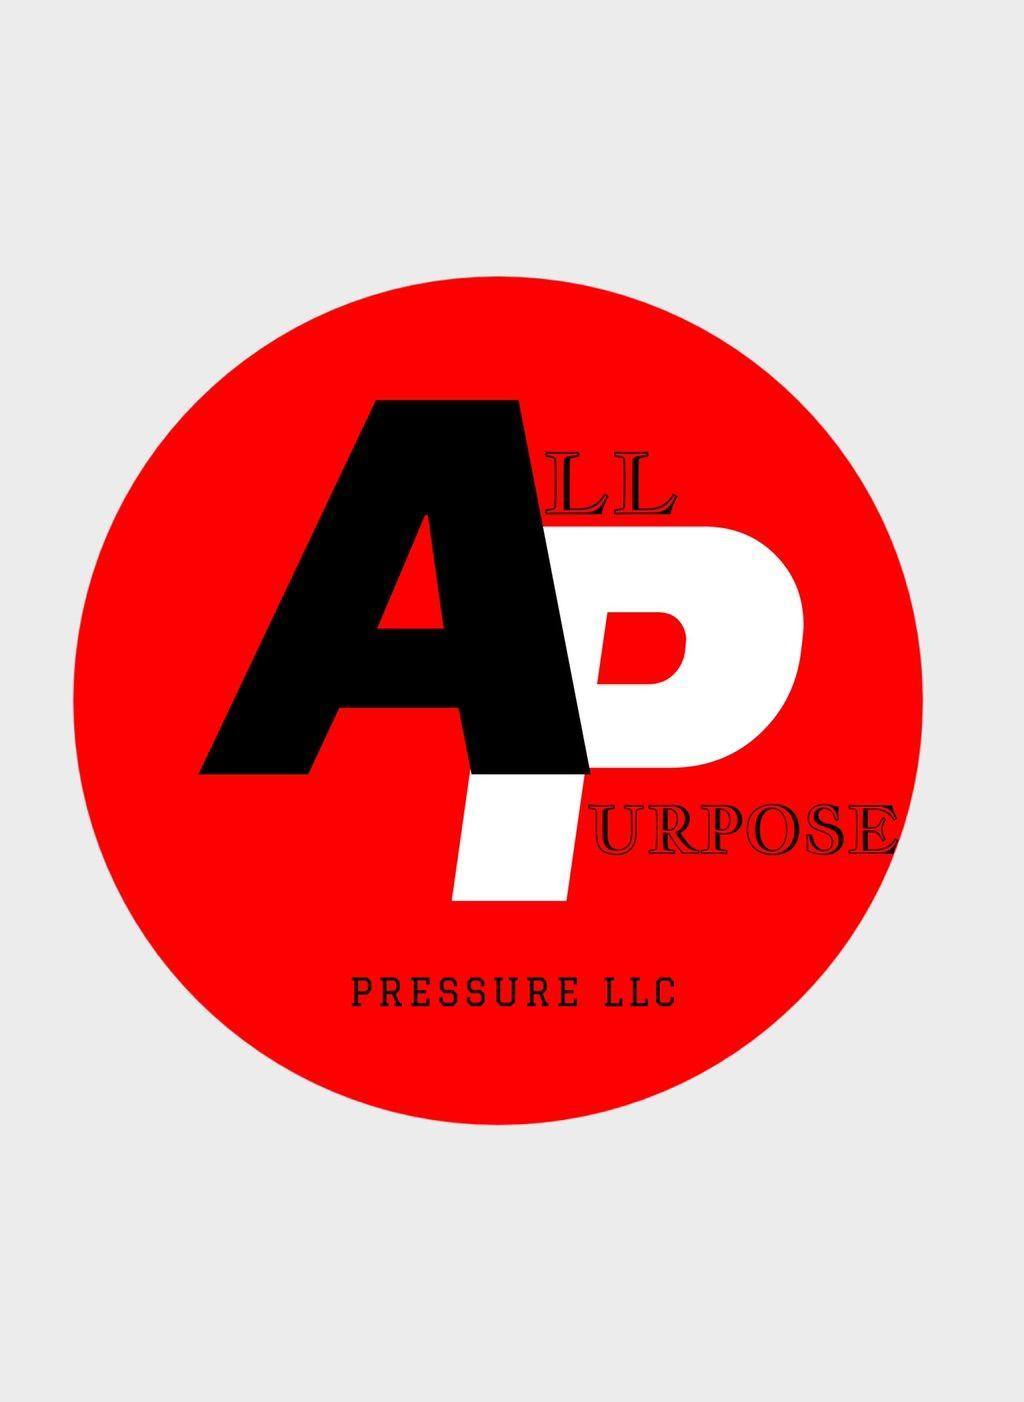 ALL PURPOSE PRESSURE LLC